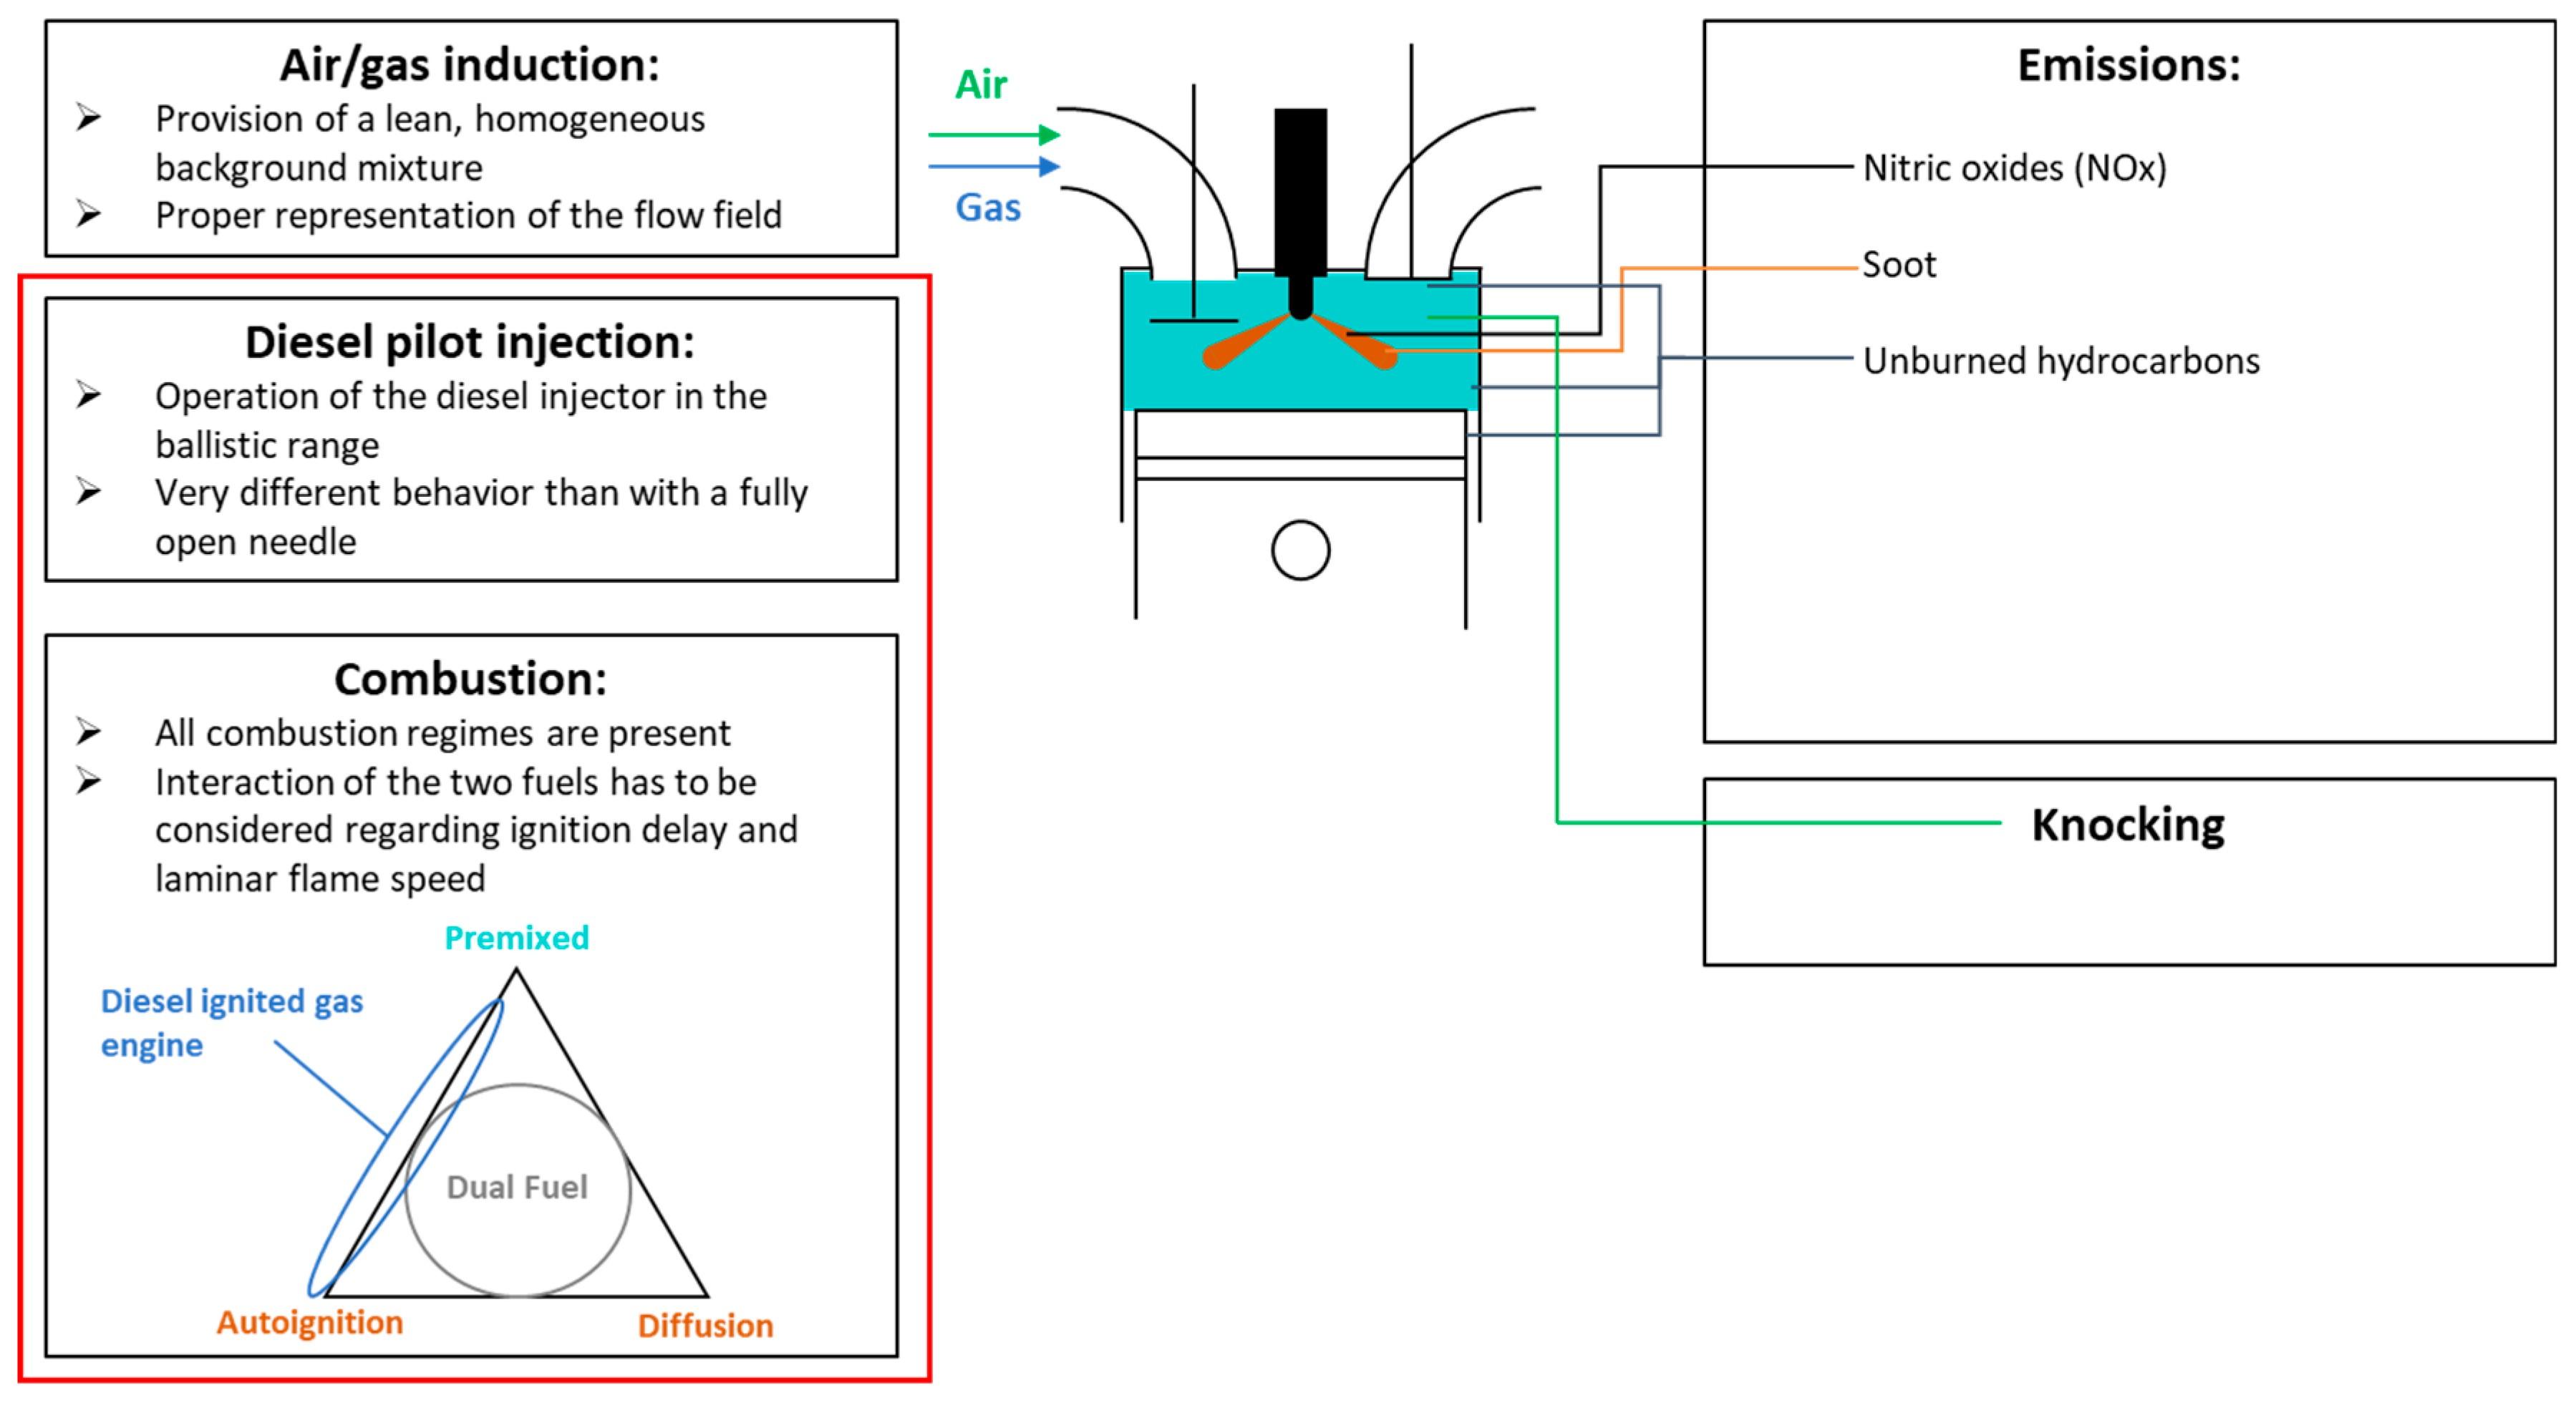 Pv Diagram for Petrol Engine Energies Free Full Text Of Pv Diagram for Petrol Engine